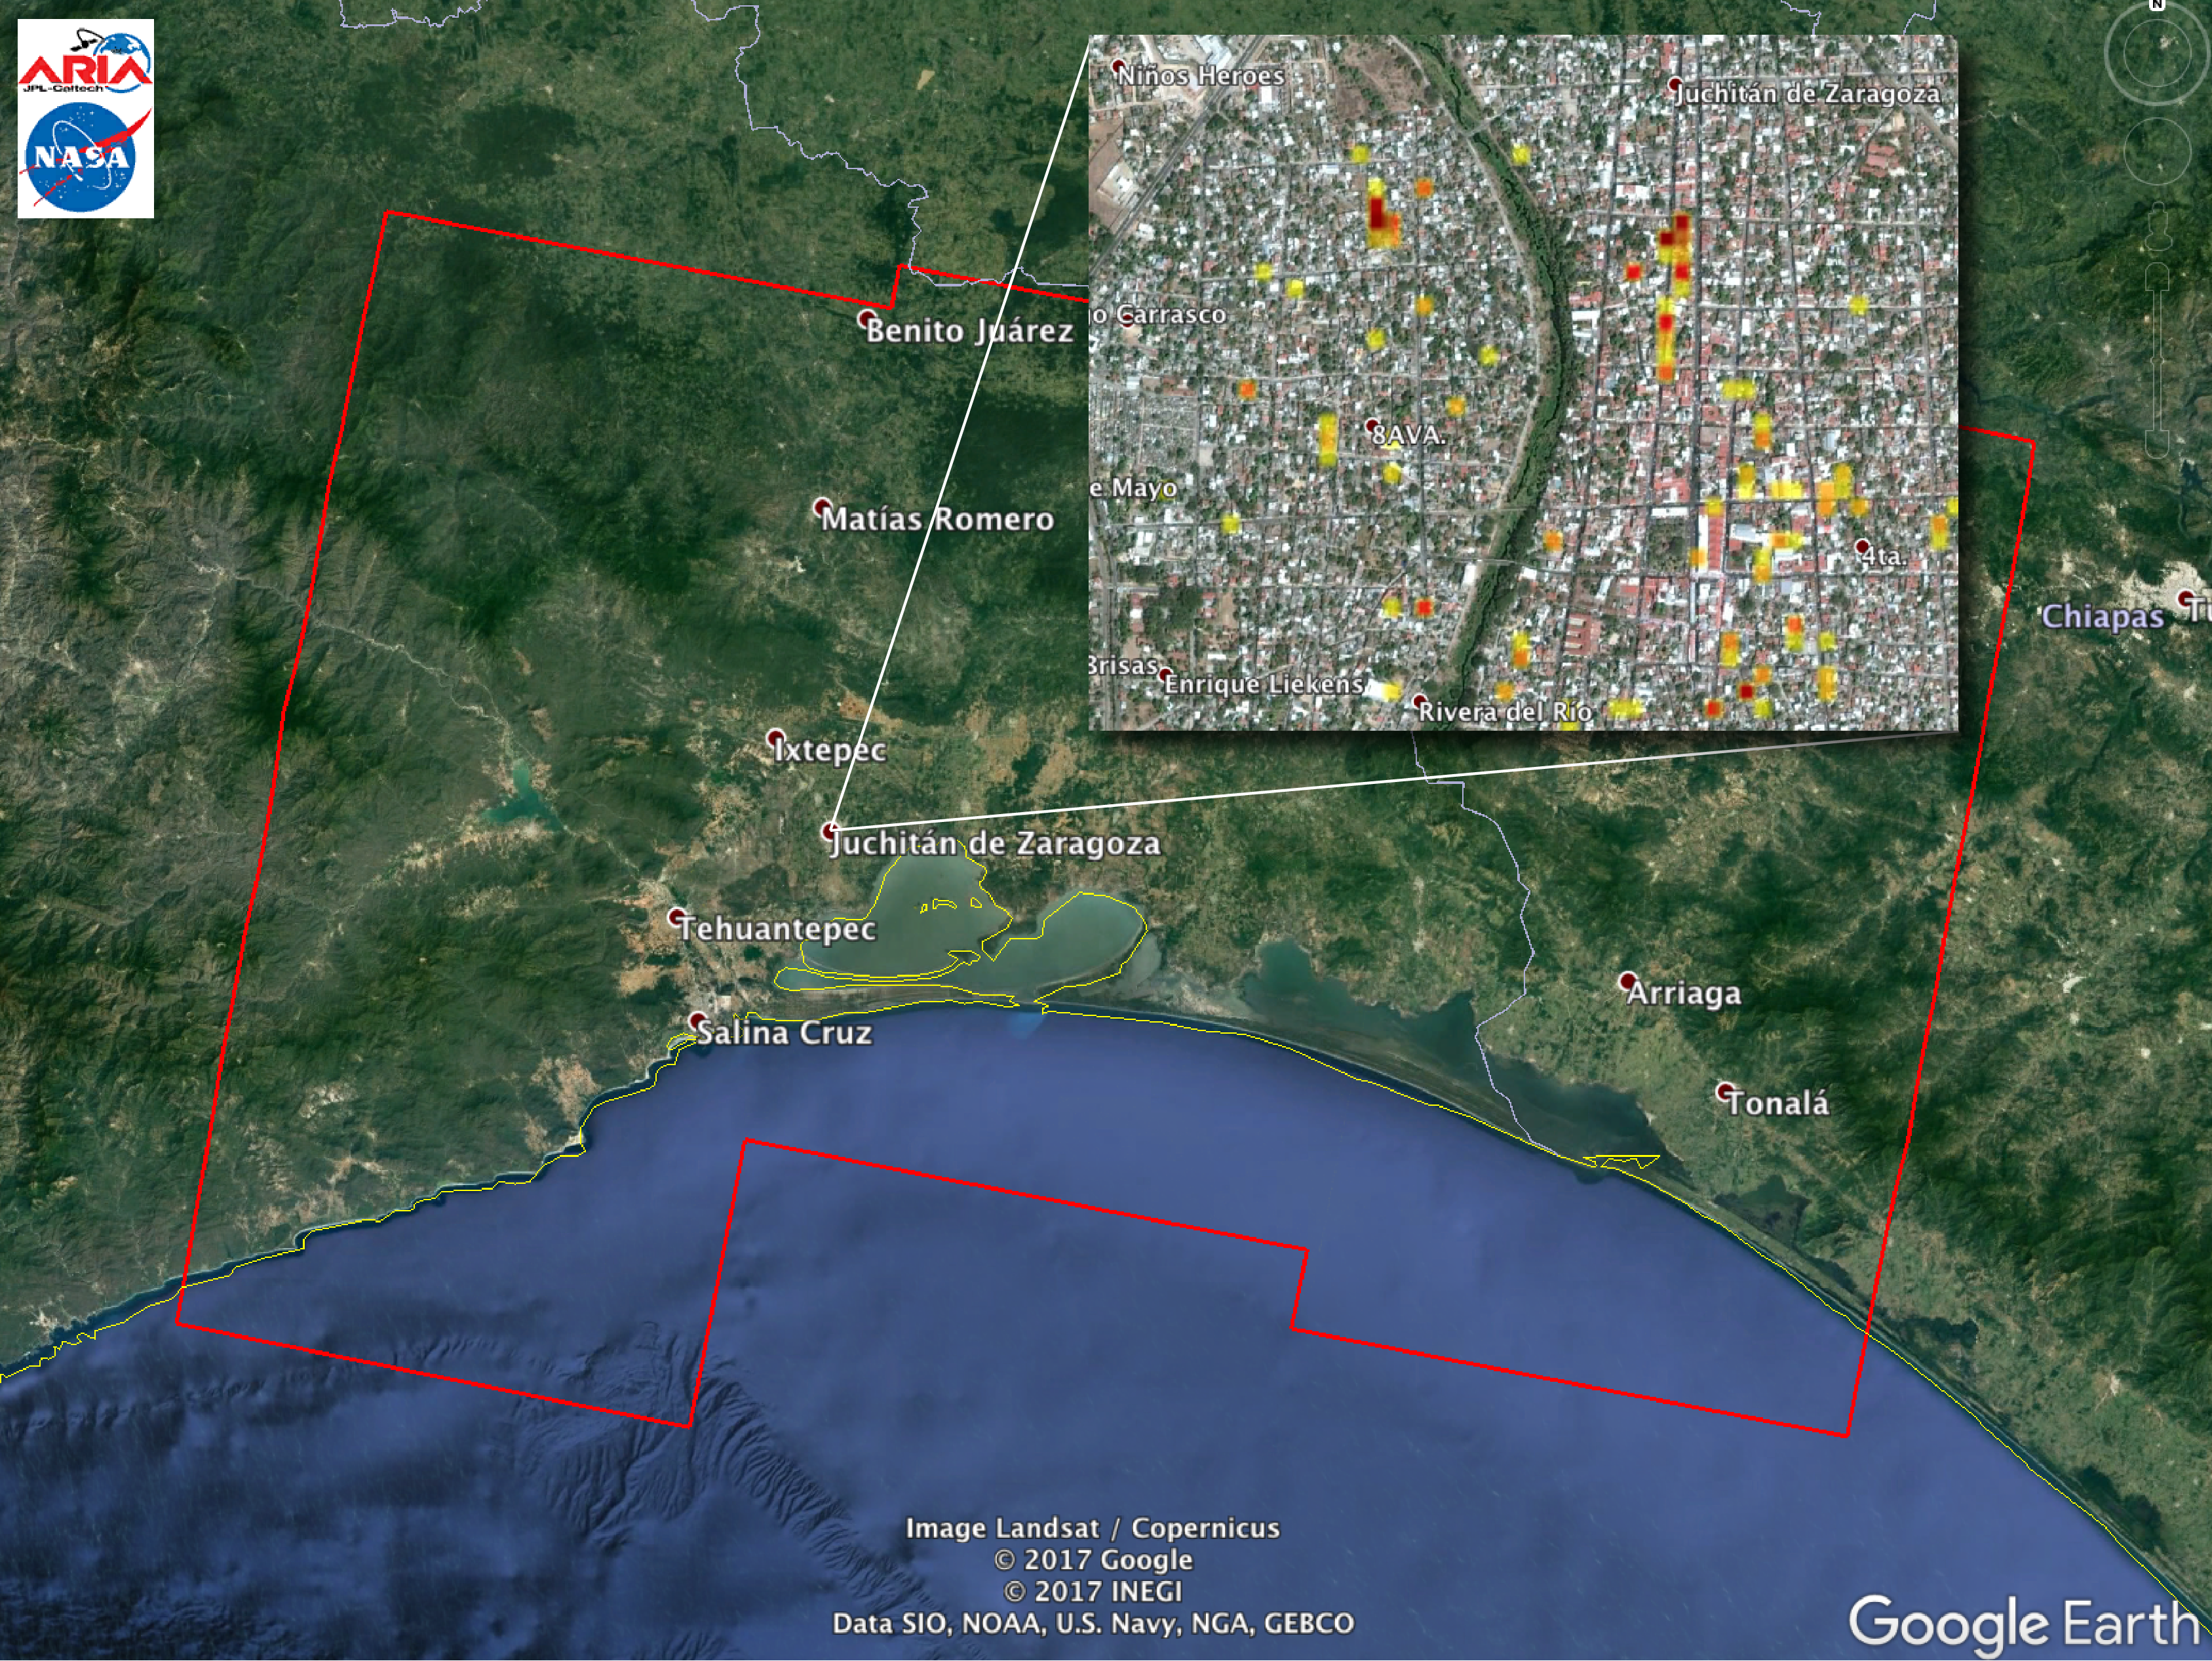 Southern Mexico Earthquake 2017 | NASA Earth Science ...